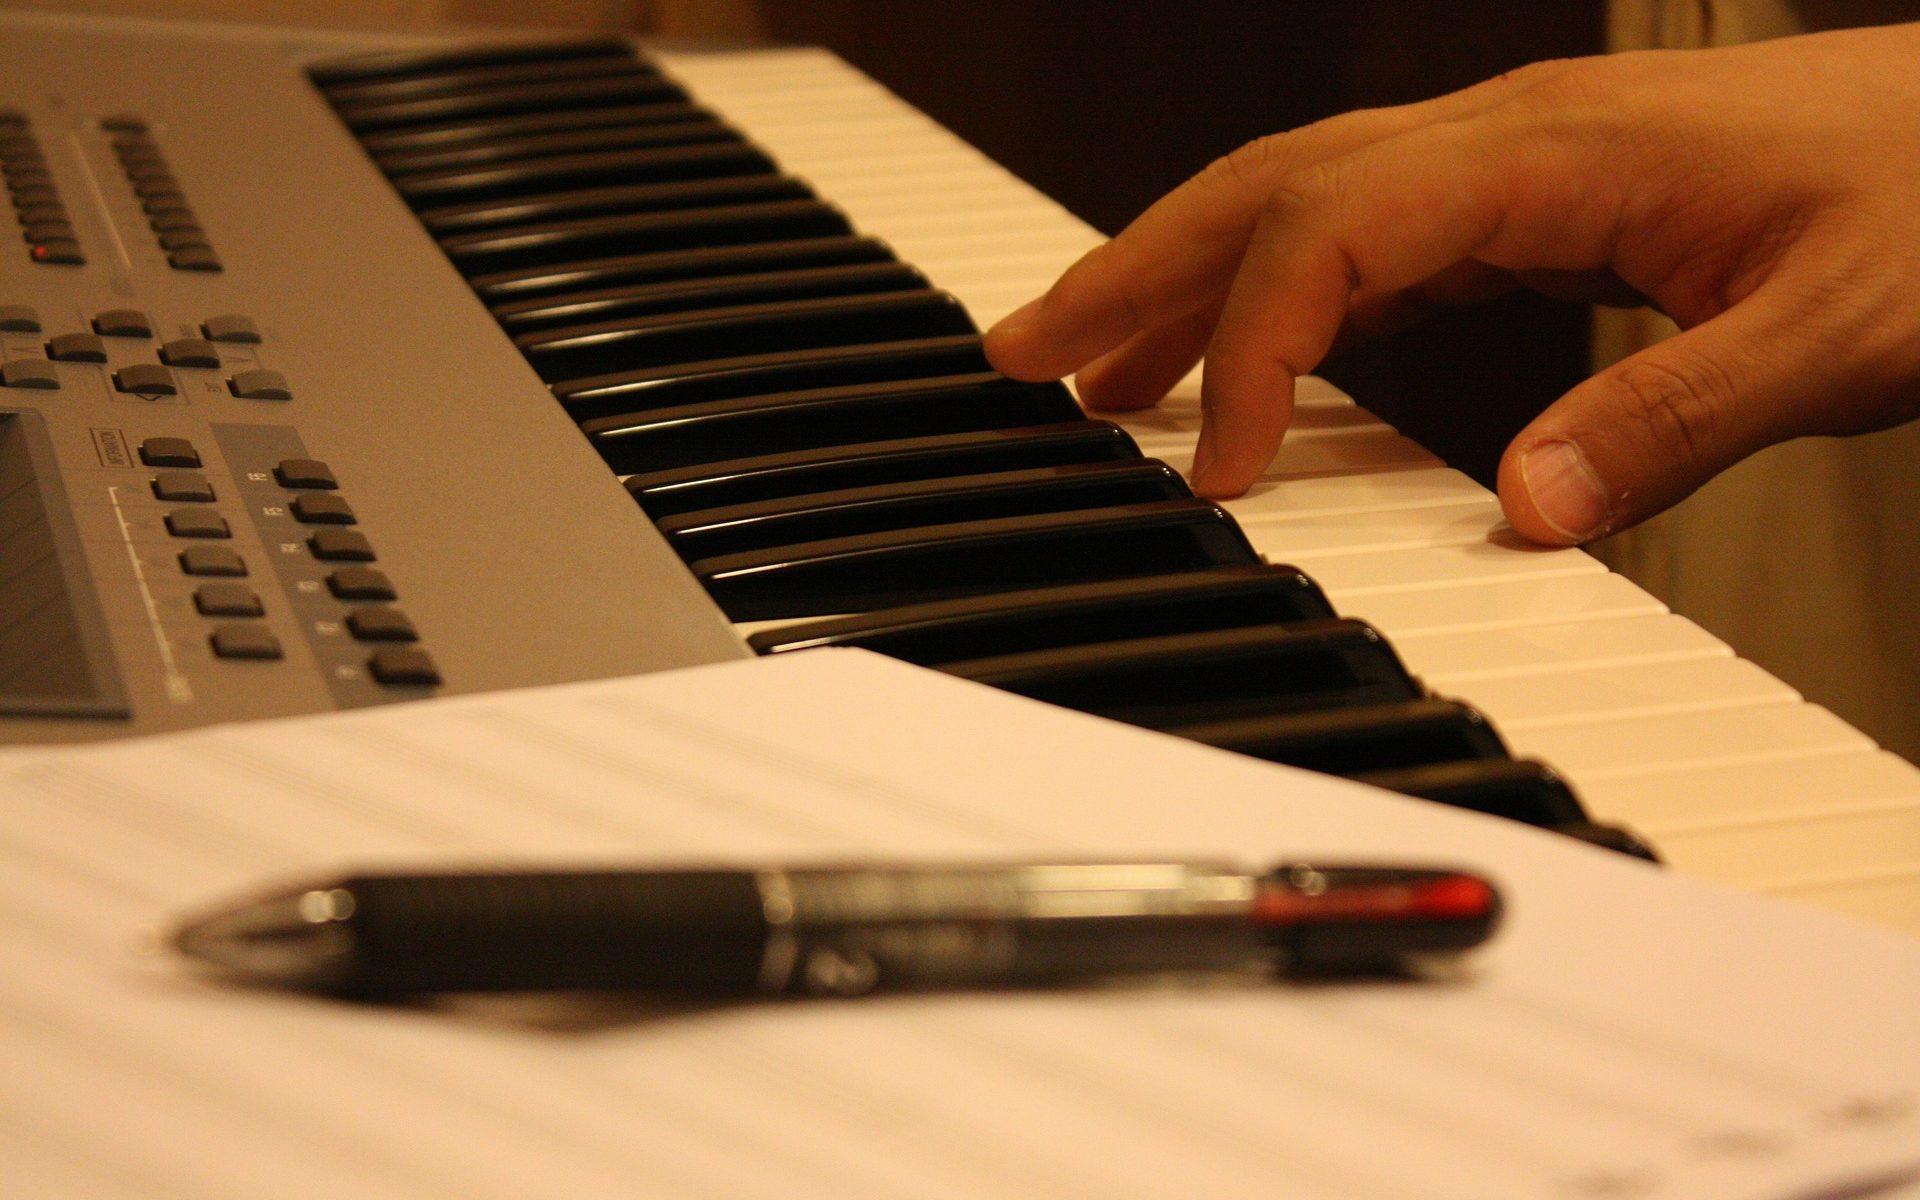 Contact us here at Piano Amore